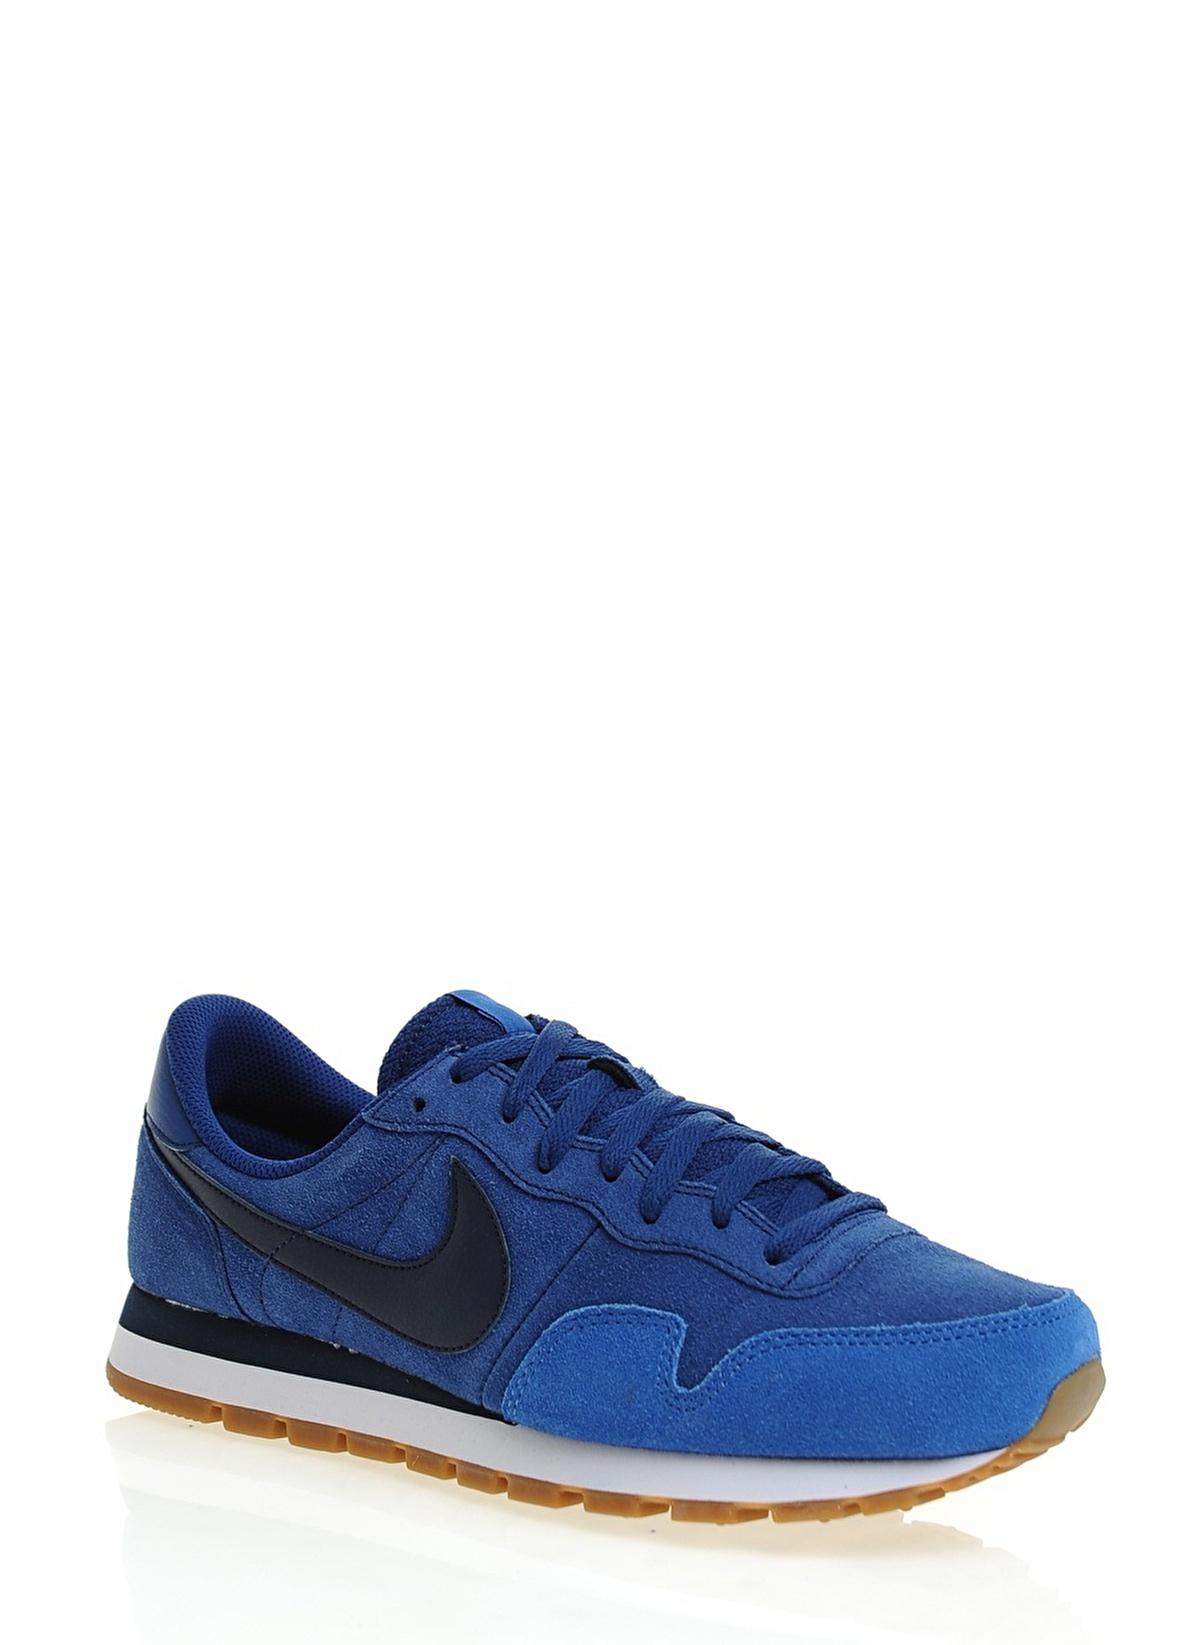 deeaf3baafc Nike Erkek Nike Air Pegasus 83 Ltr Coastal Blue Obsidian-Star Blu ...